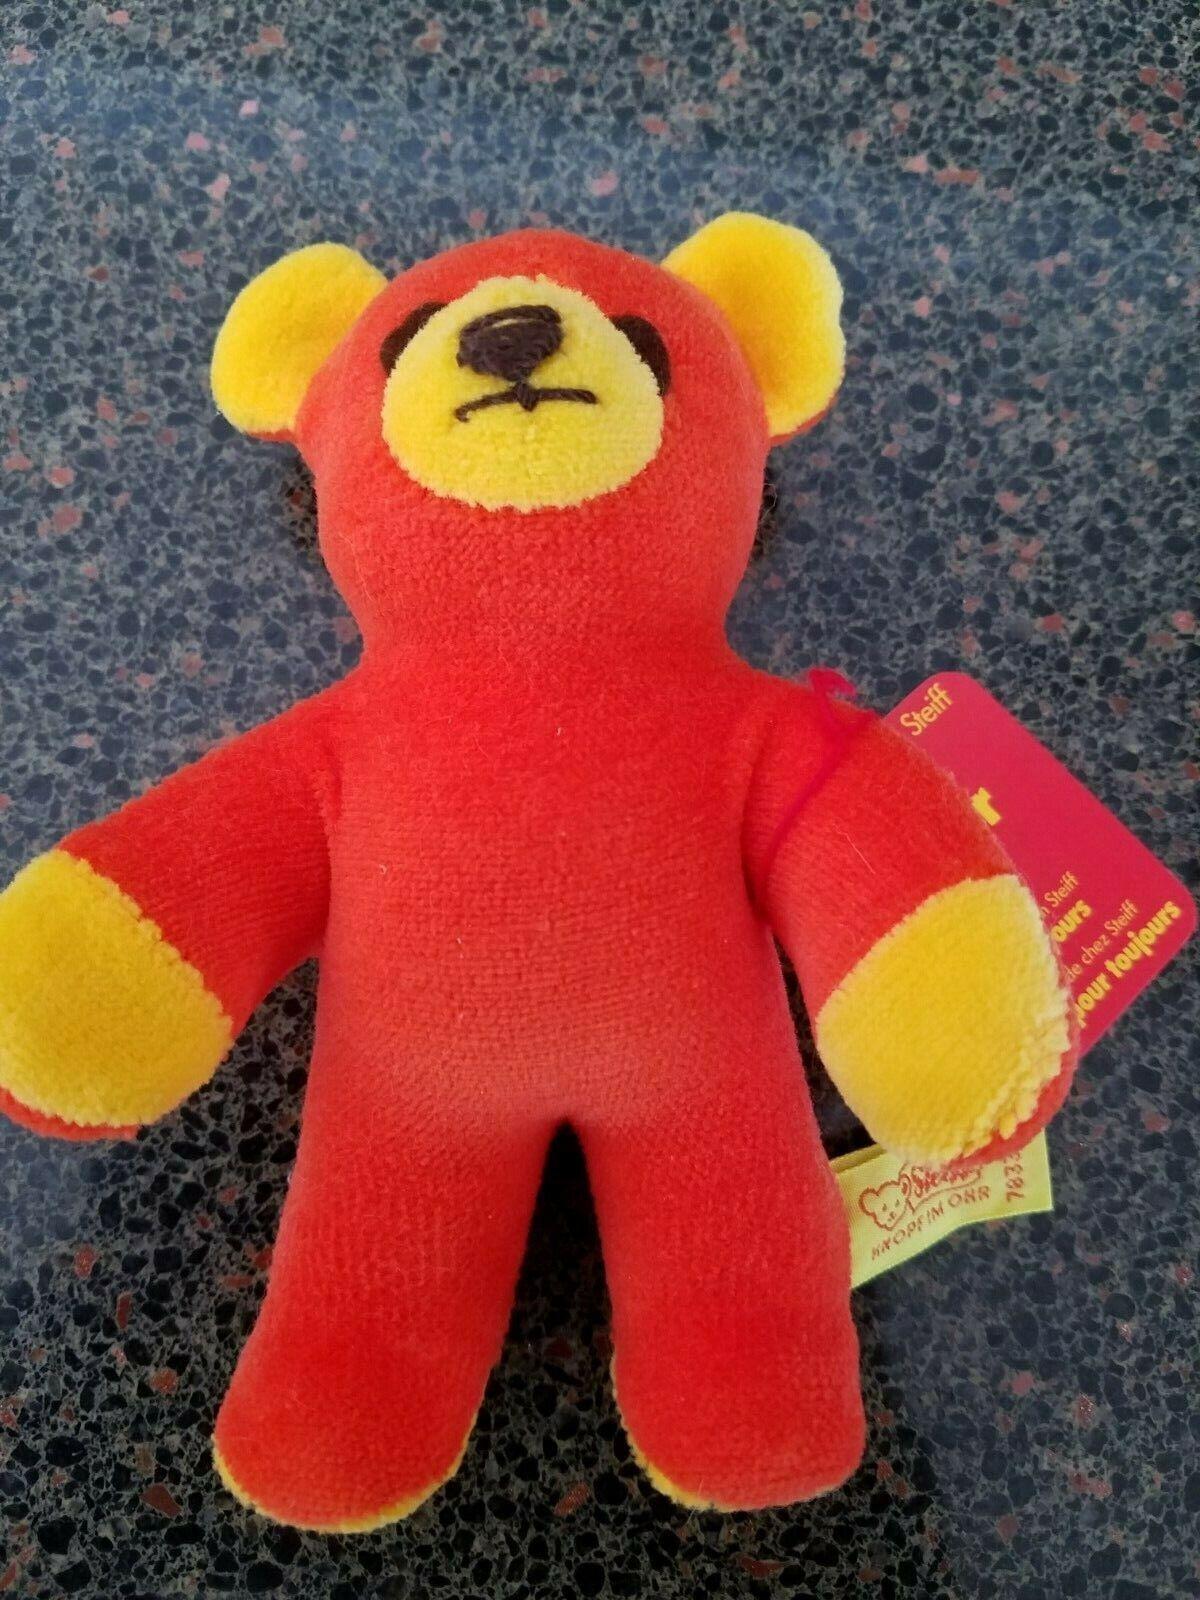 Dolls & Bears Honest Charlie Bears Isabelle Lee Masterpiece 2015 Ltd Edition 76 Of 350 Sales Of Quality Assurance Artist